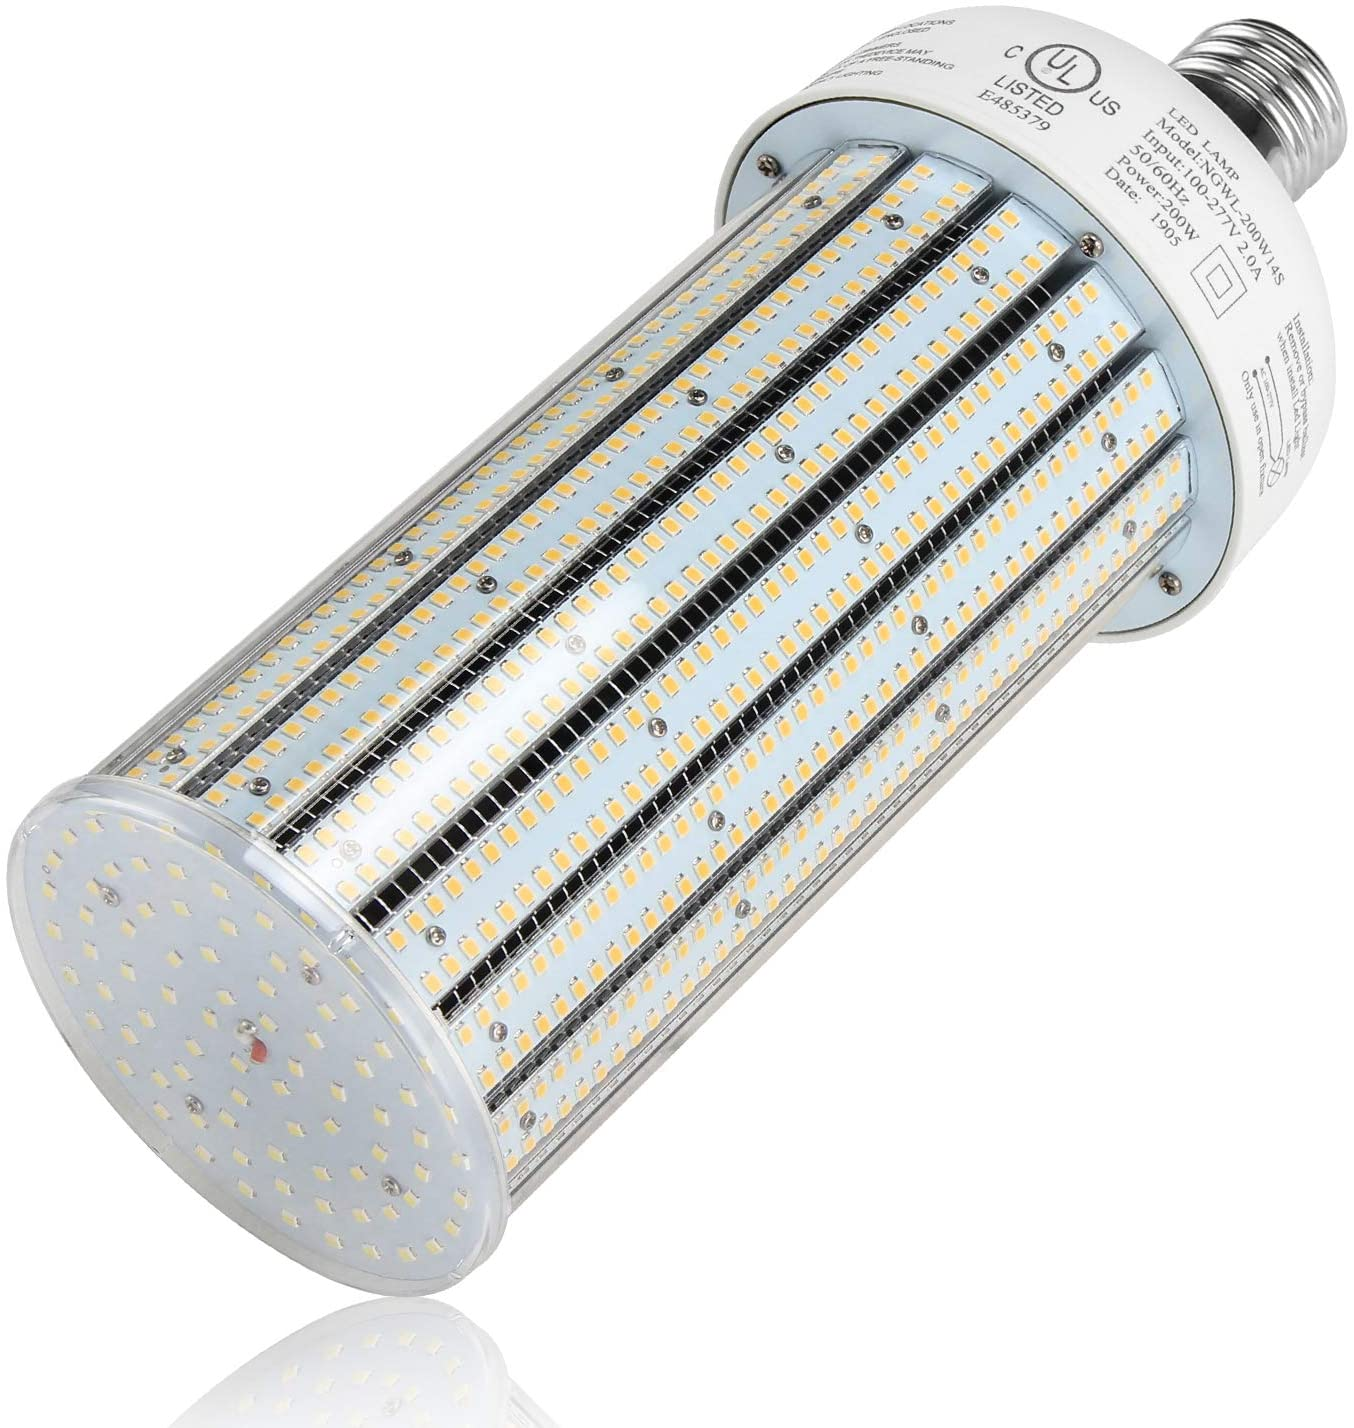 200W LED Corn Light Bulbs-1000W Metal Halide HID HPS Replacement- UL Listed DLC 27000LM E39 Base 6000K Cool White Cob Lamp for Warehouse Factory High Bay Garage Autoshop Gym Lighting Fixture Retrofits